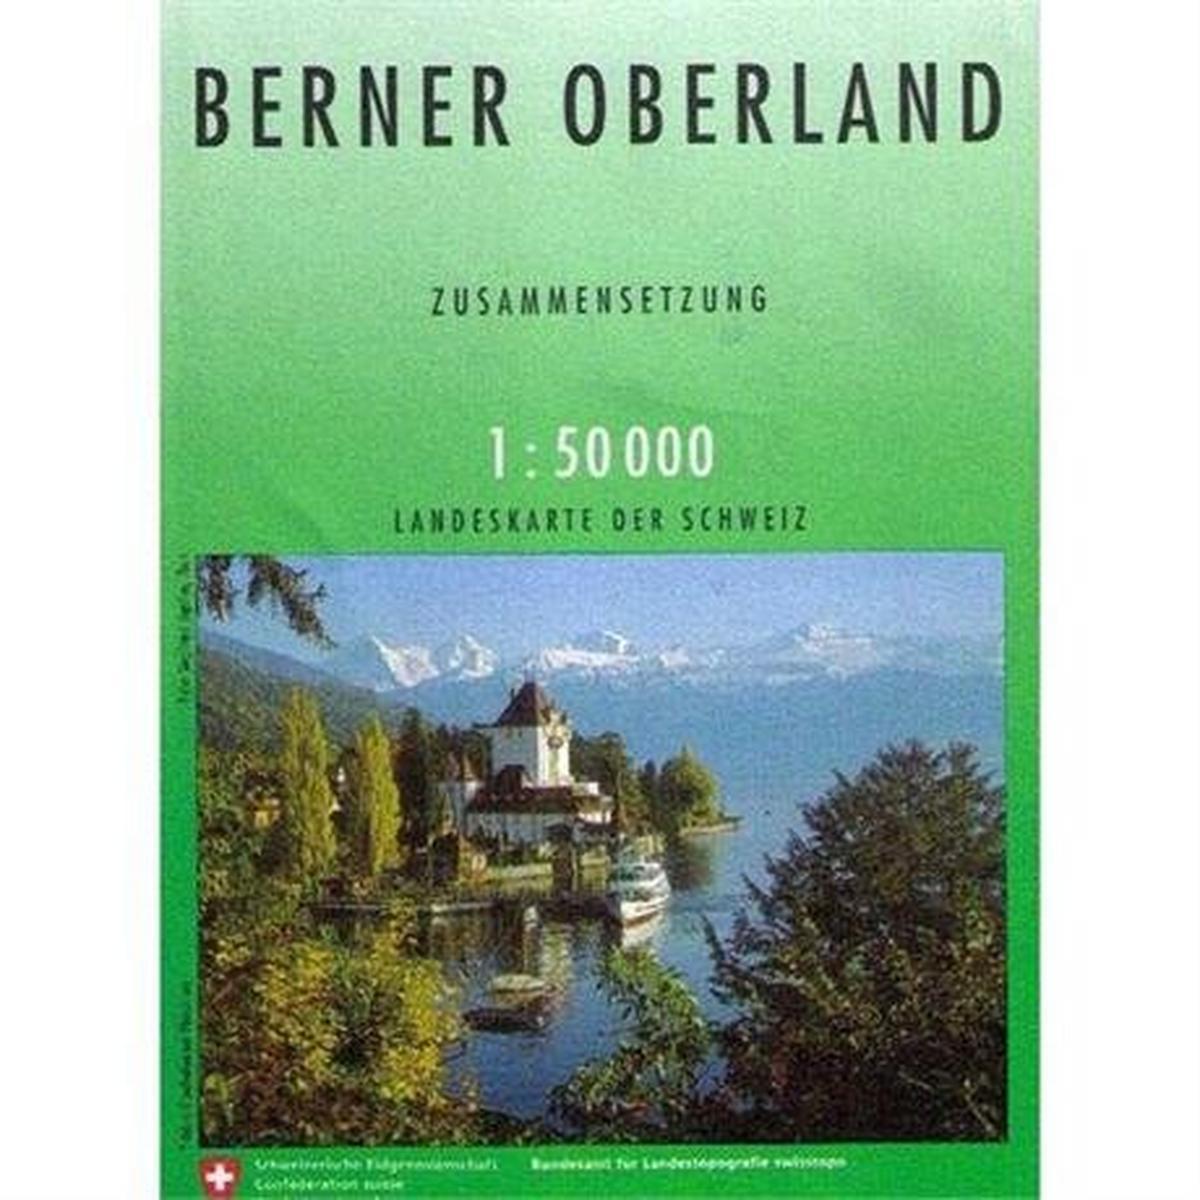 Miscellaneous Switzerland Map 5004 Berner Oberland